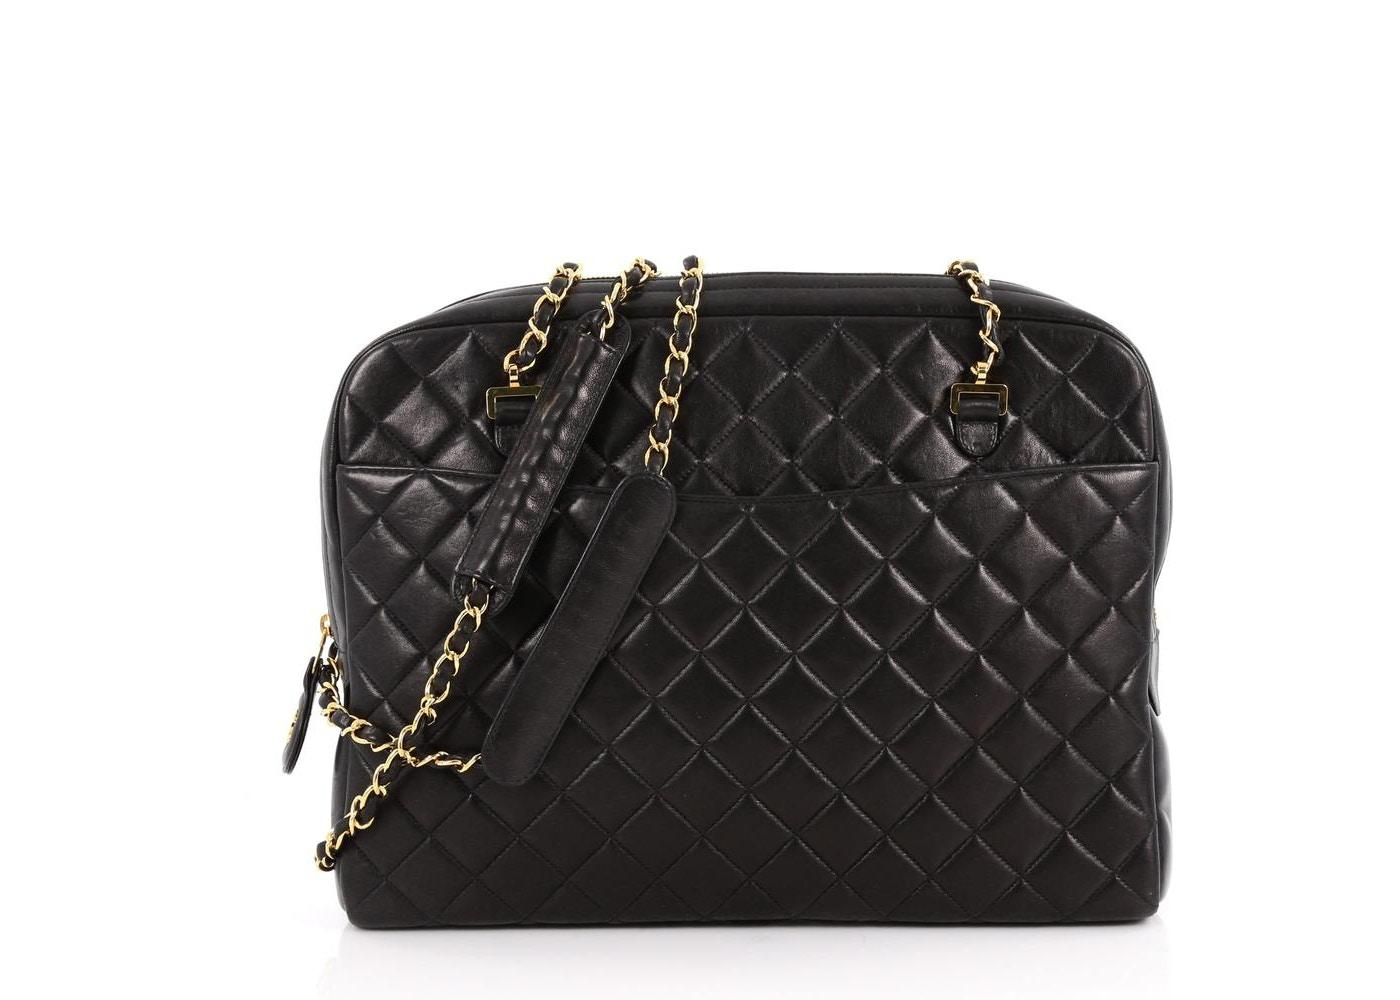 92c05c0e0e5b Chanel Vintage Camera Bag Quilted Large Black. Quilted Large Black